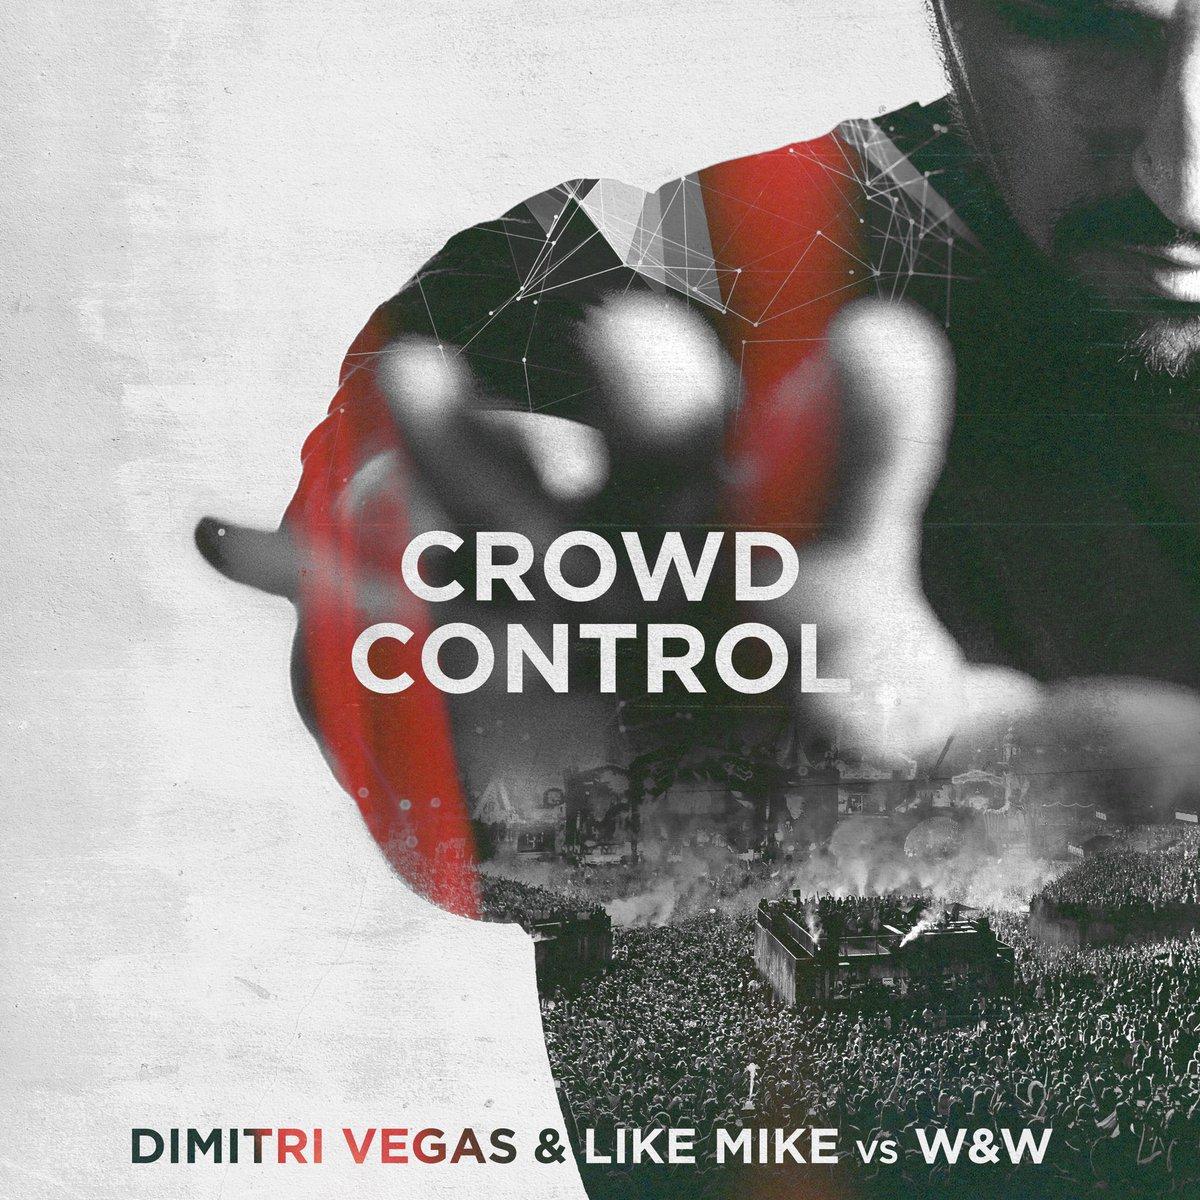 Dimitri Vegas & Like Mike vs W&W -  Crowd Control